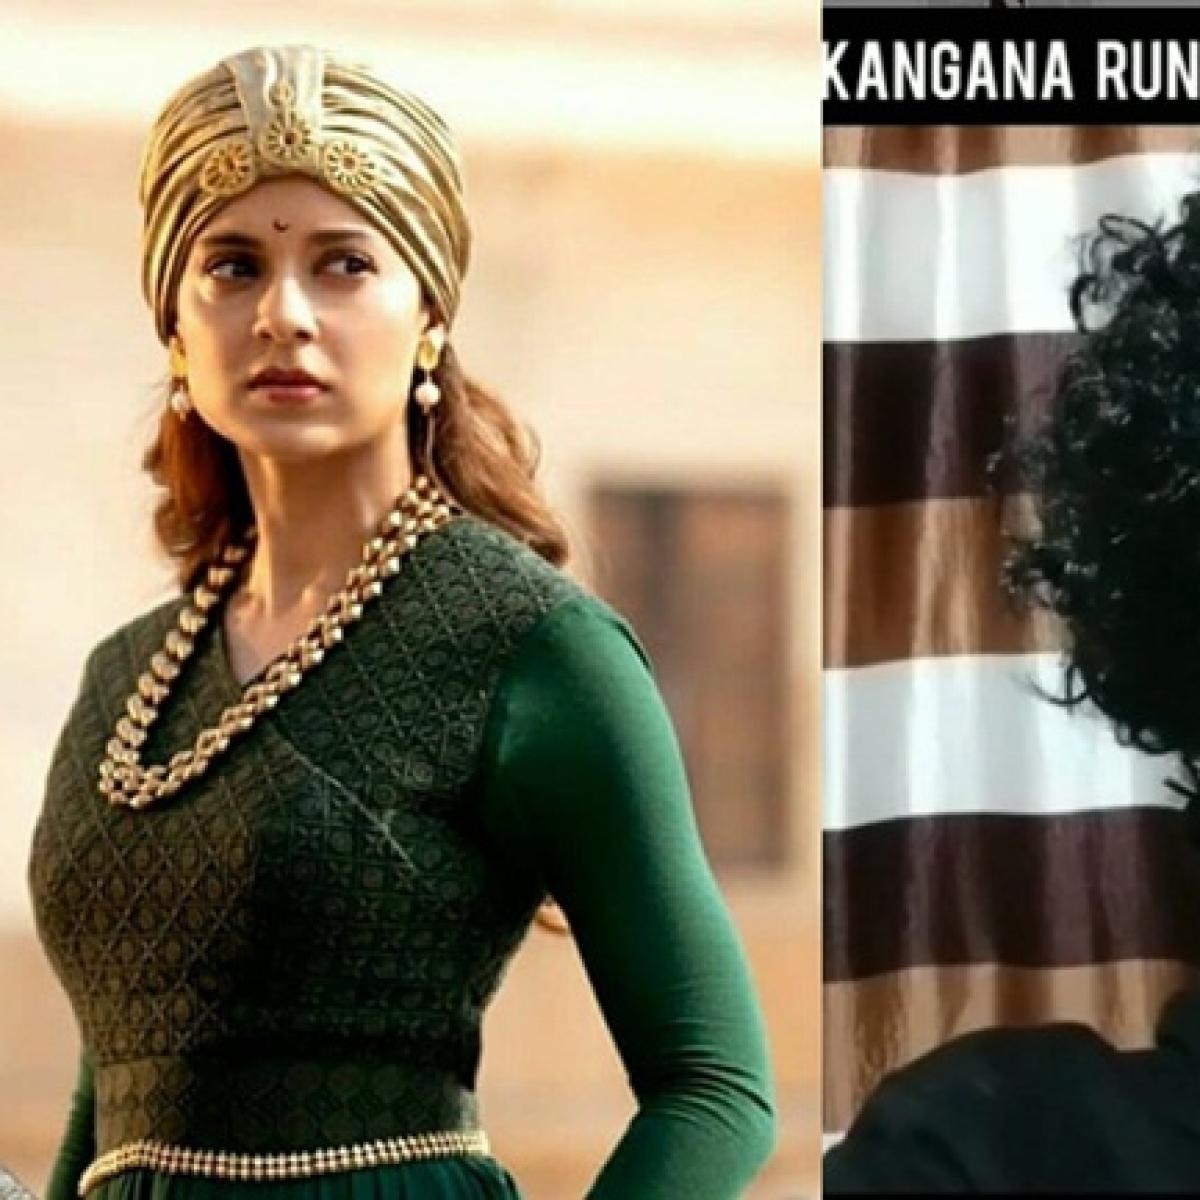 'Meri to ungli karne ki aadat hai': Nazma Aapi's Kangana Ranaut has a real problem with 'no-touch' during coronavirus